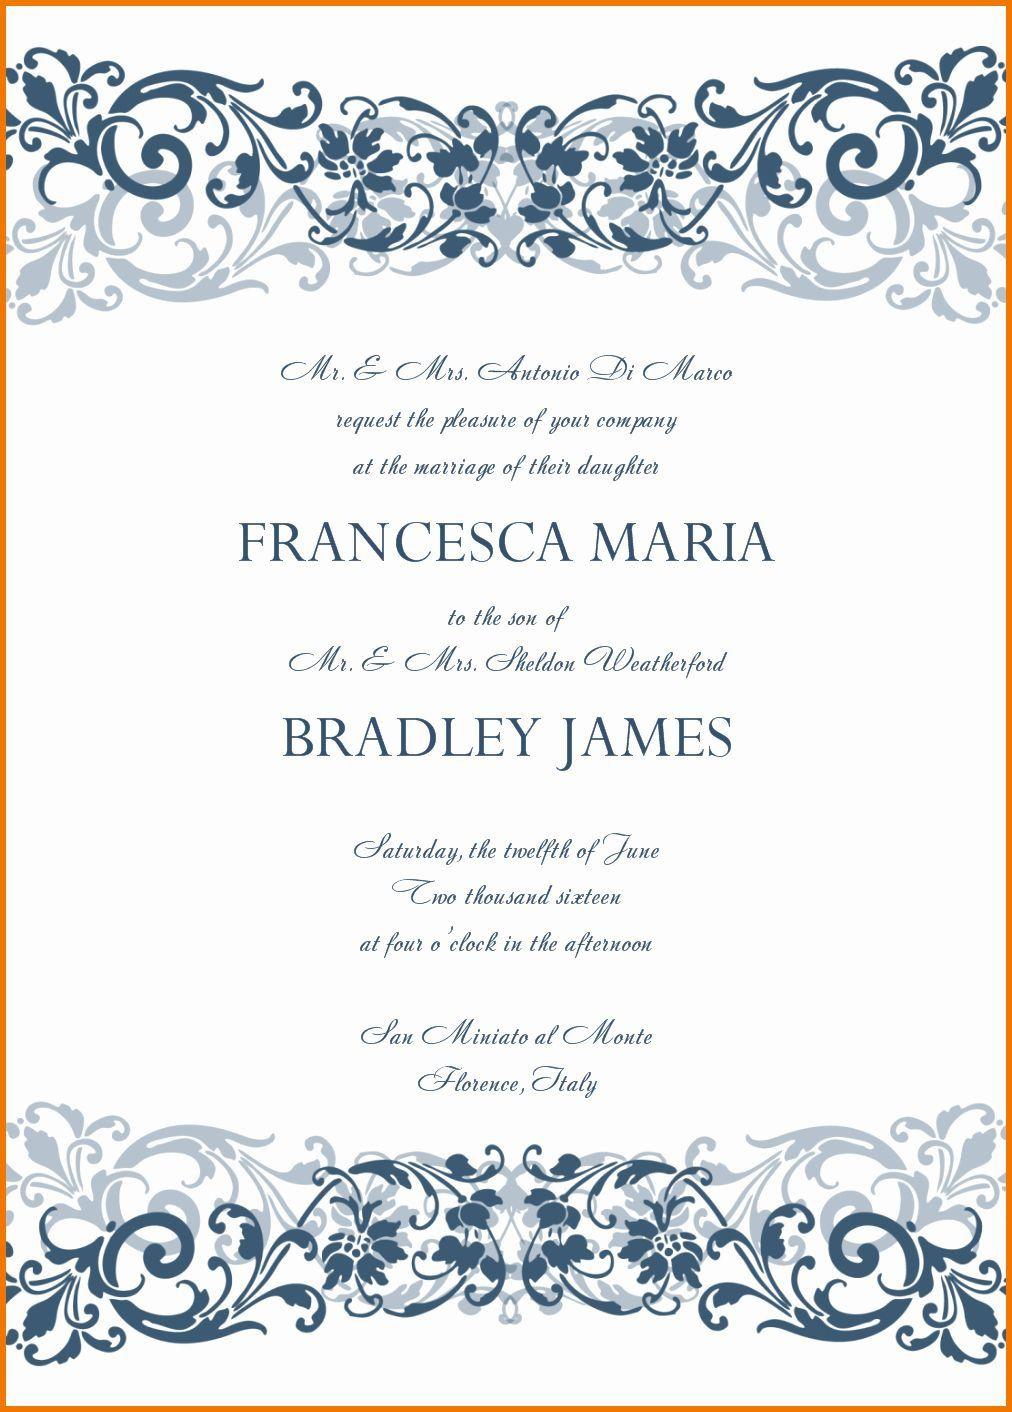 007 Unforgettable Microsoft Office Wedding Invitation Template Highest Clarity  Templates MFull